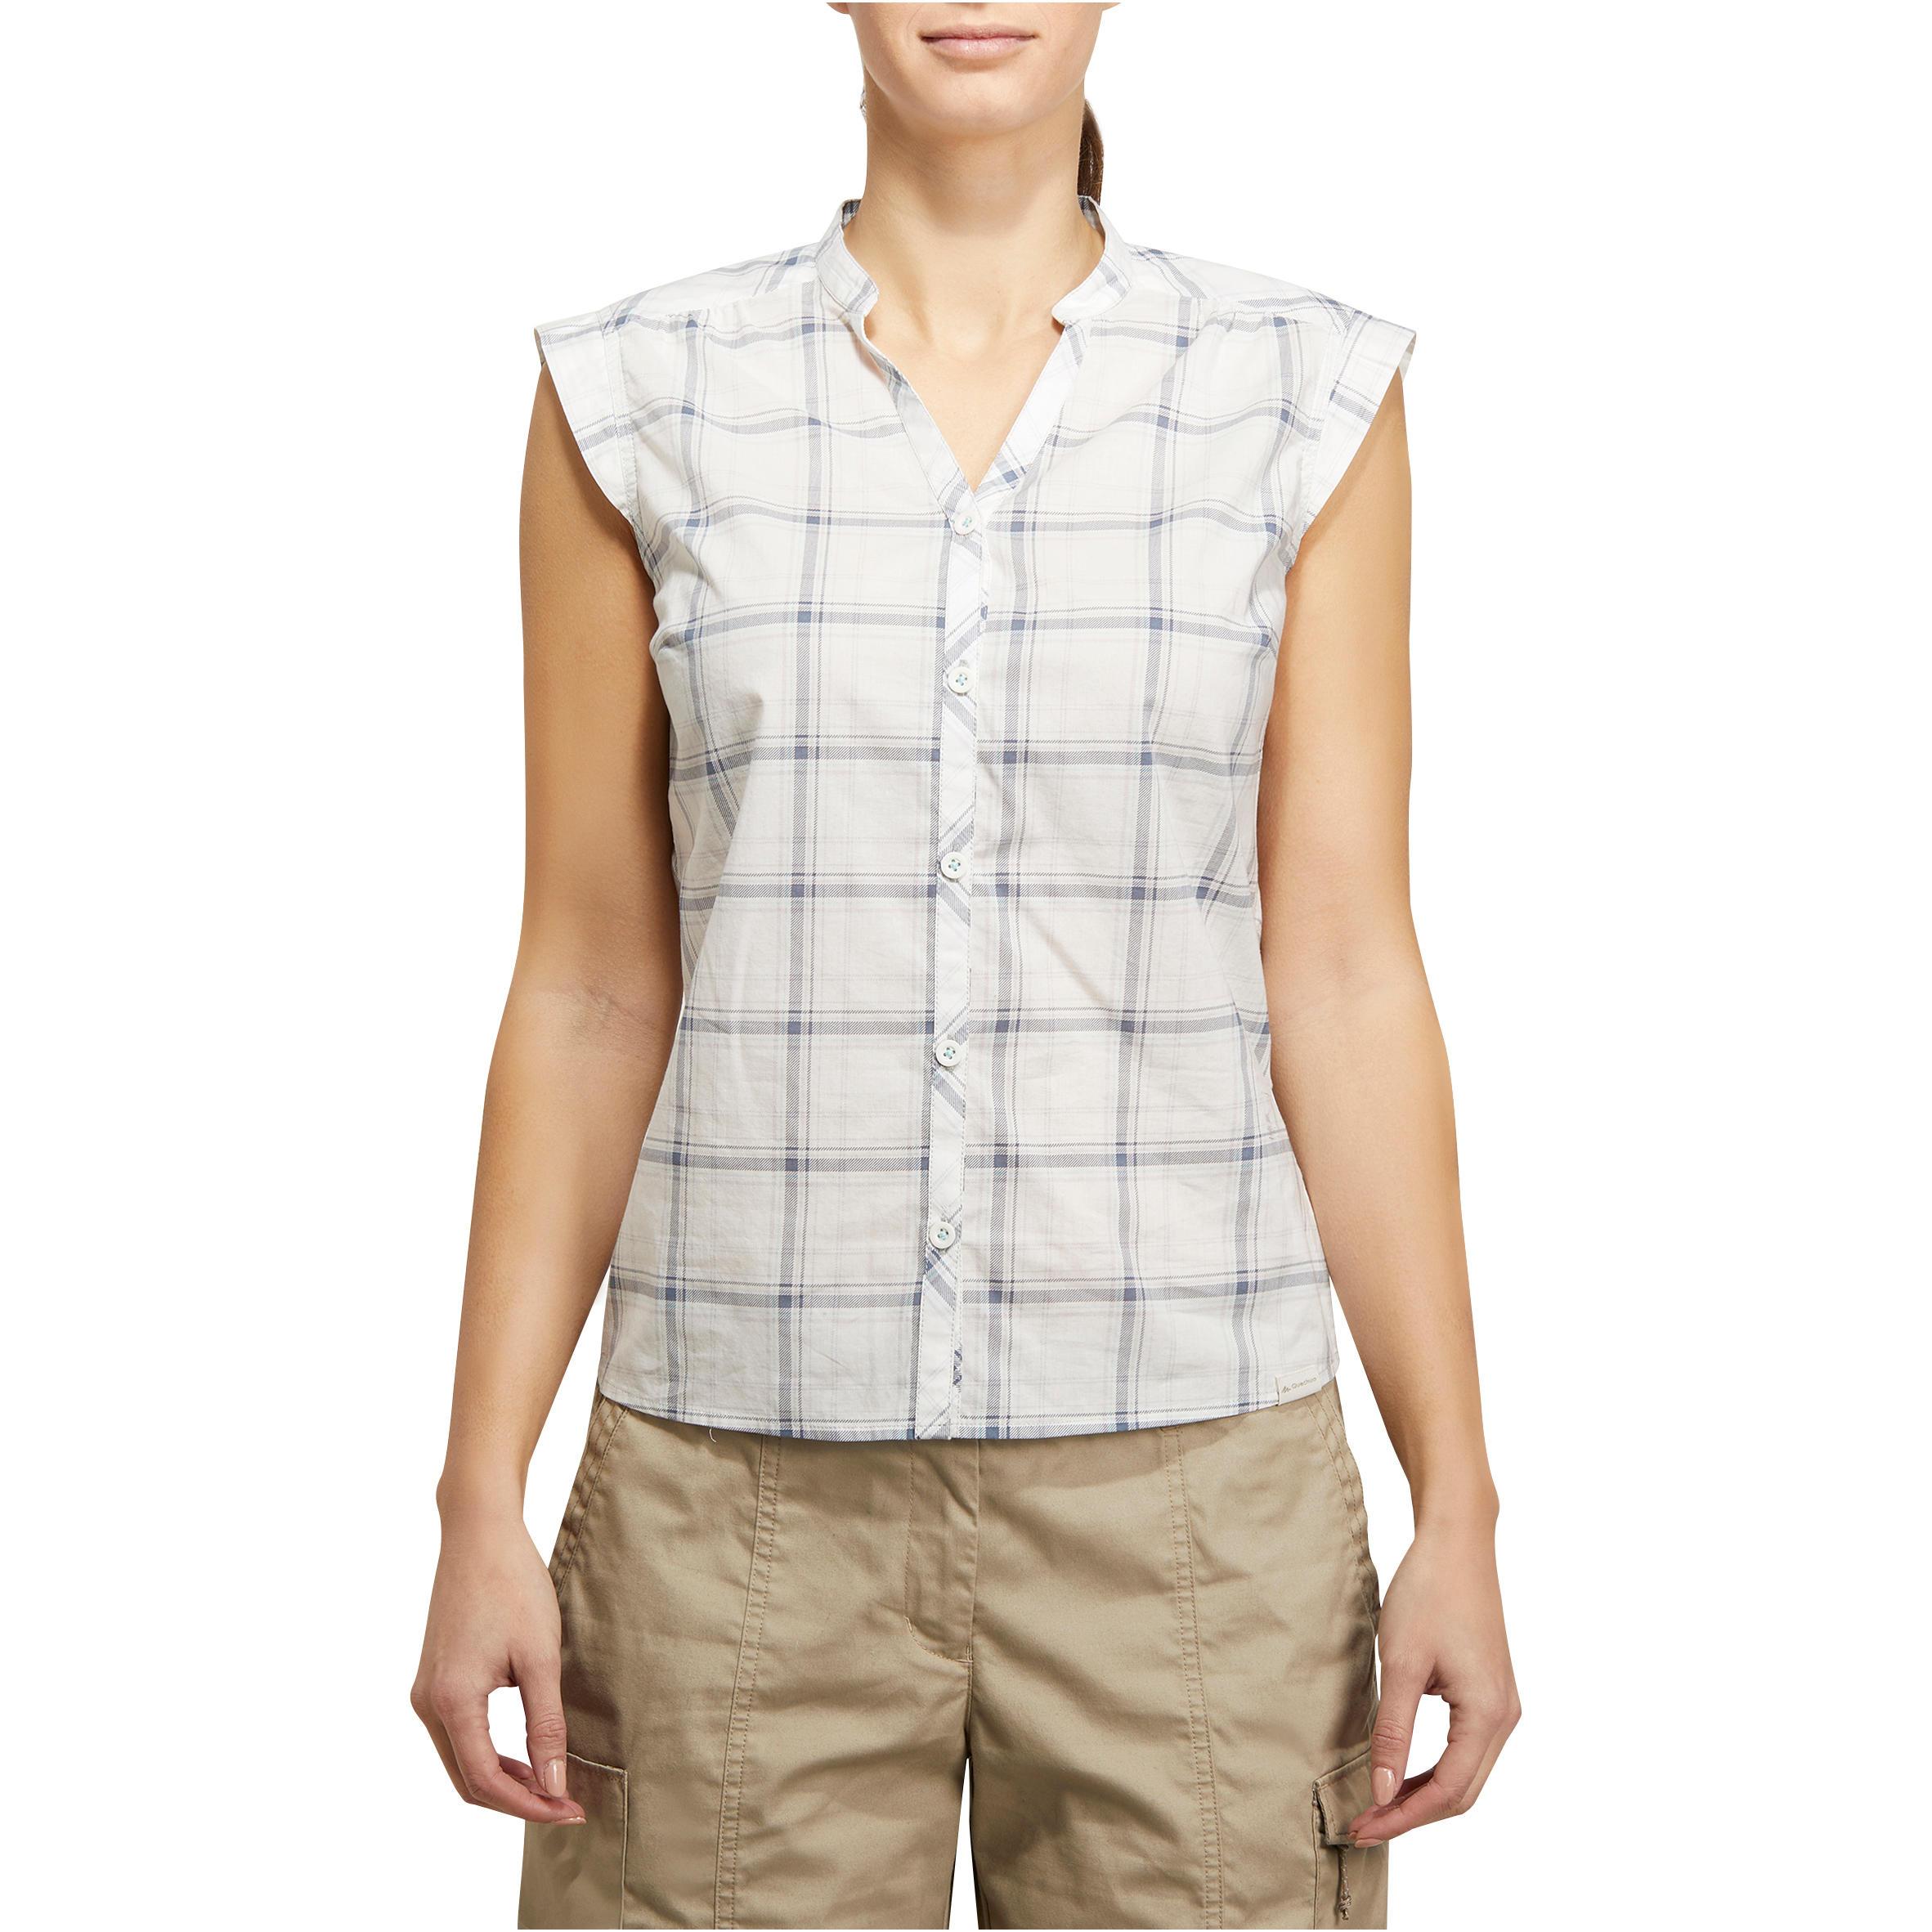 Arpenaz 100 Woman's Sleeveless Hiking Shirt – Grey Diamonds